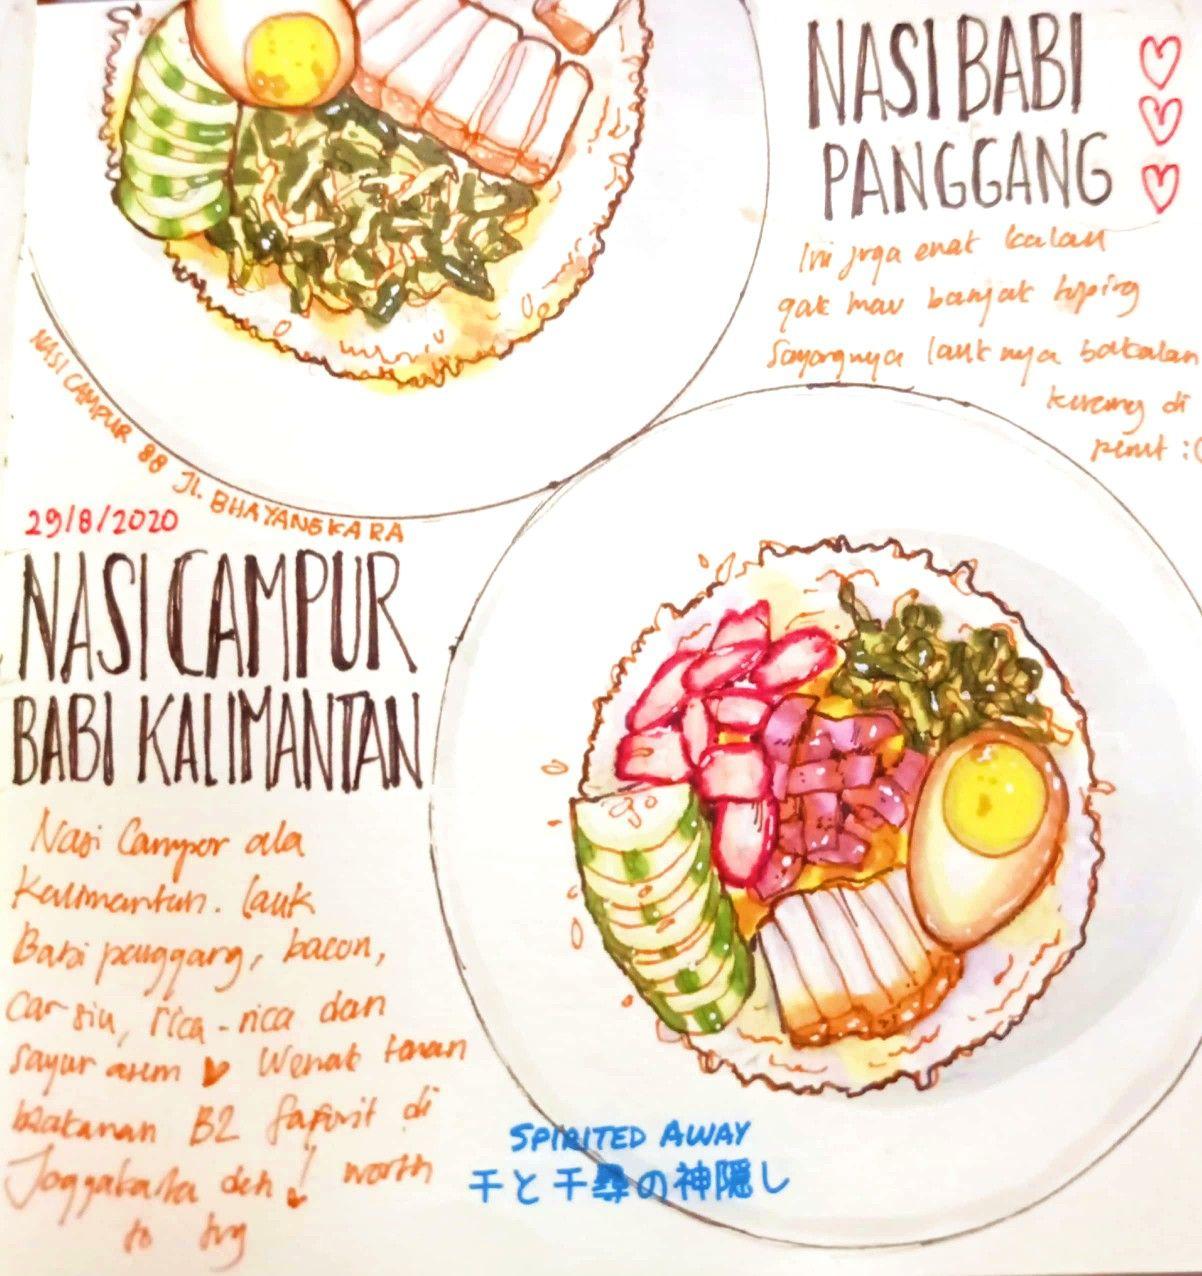 Nasi Campur Kalimantan Panggang